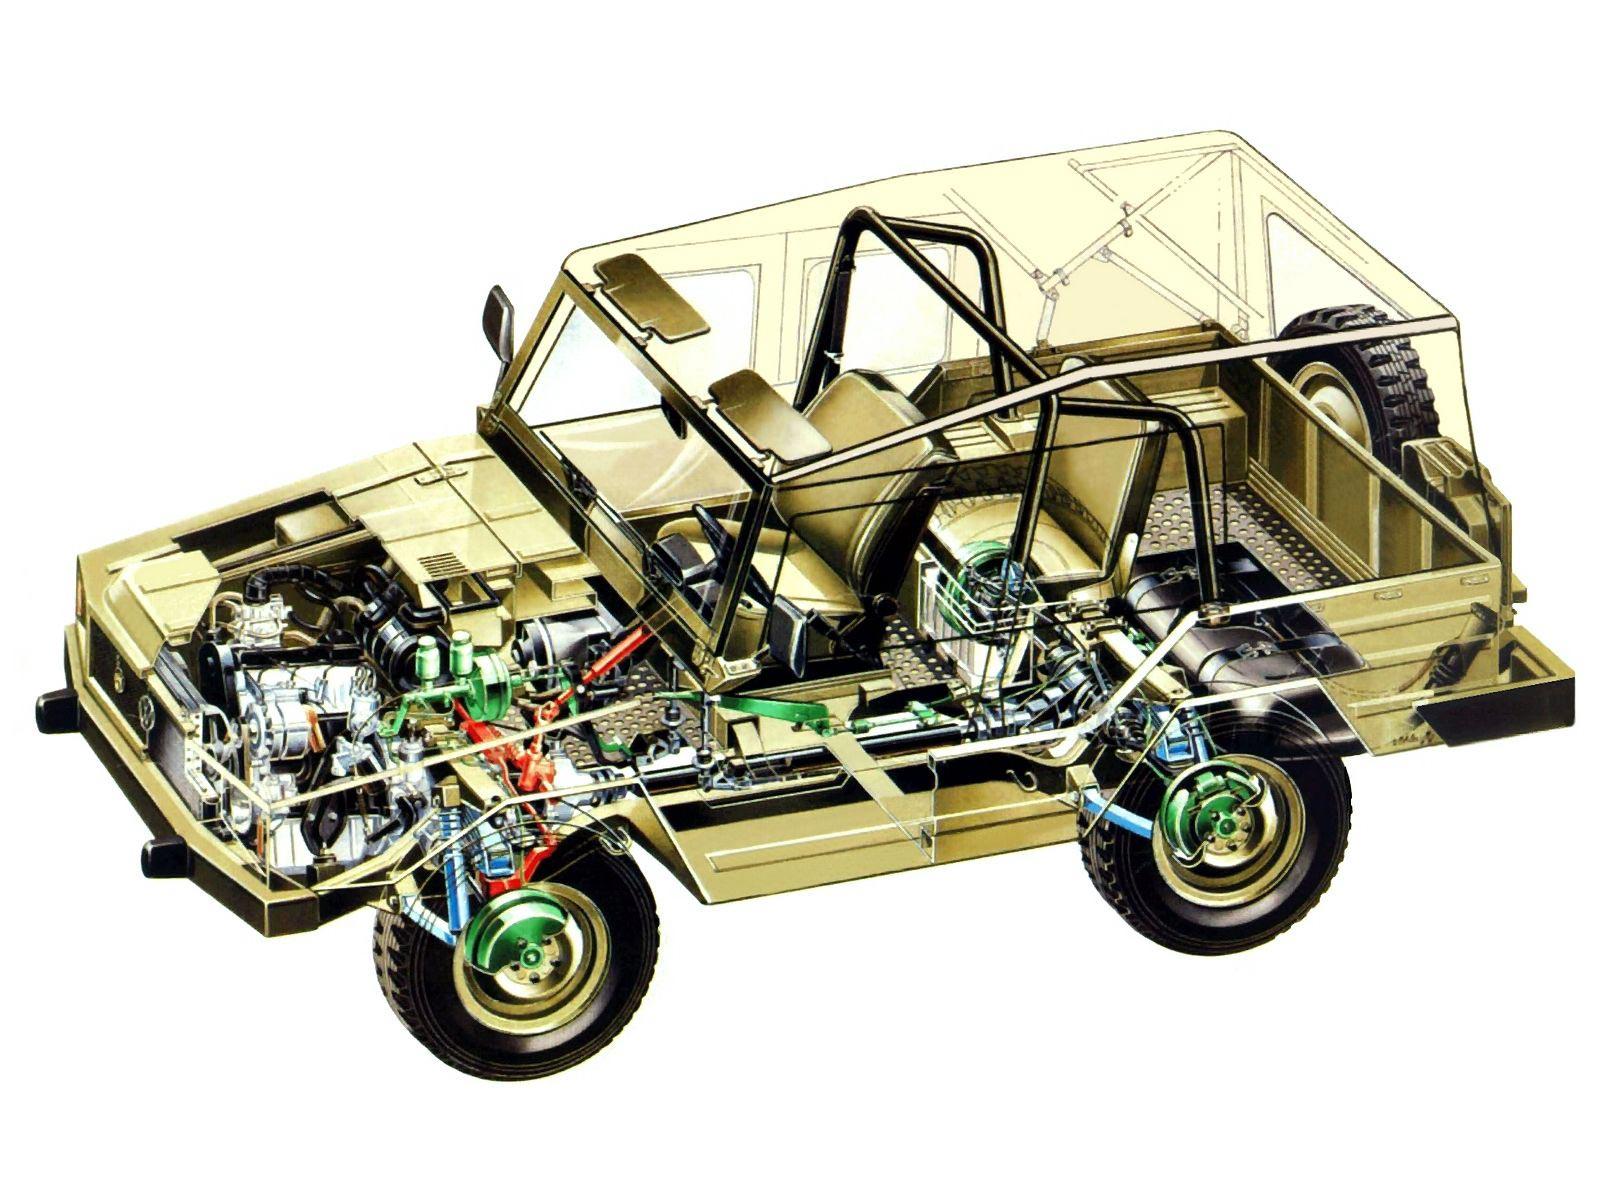 Volkswagen Iltis cutaway drawing